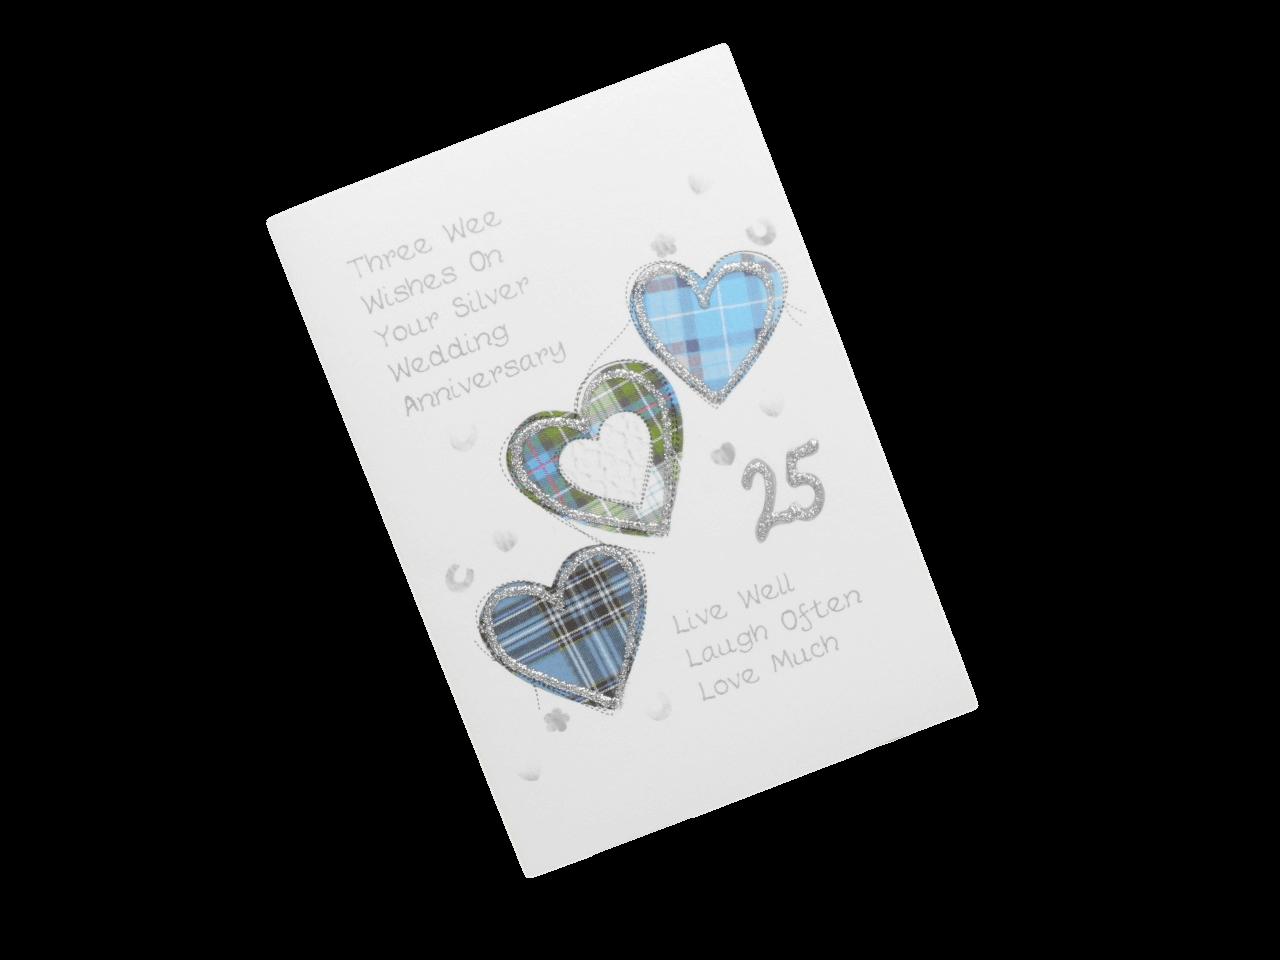 scottish silver 25th anniversary card tartan hearts doric scots language